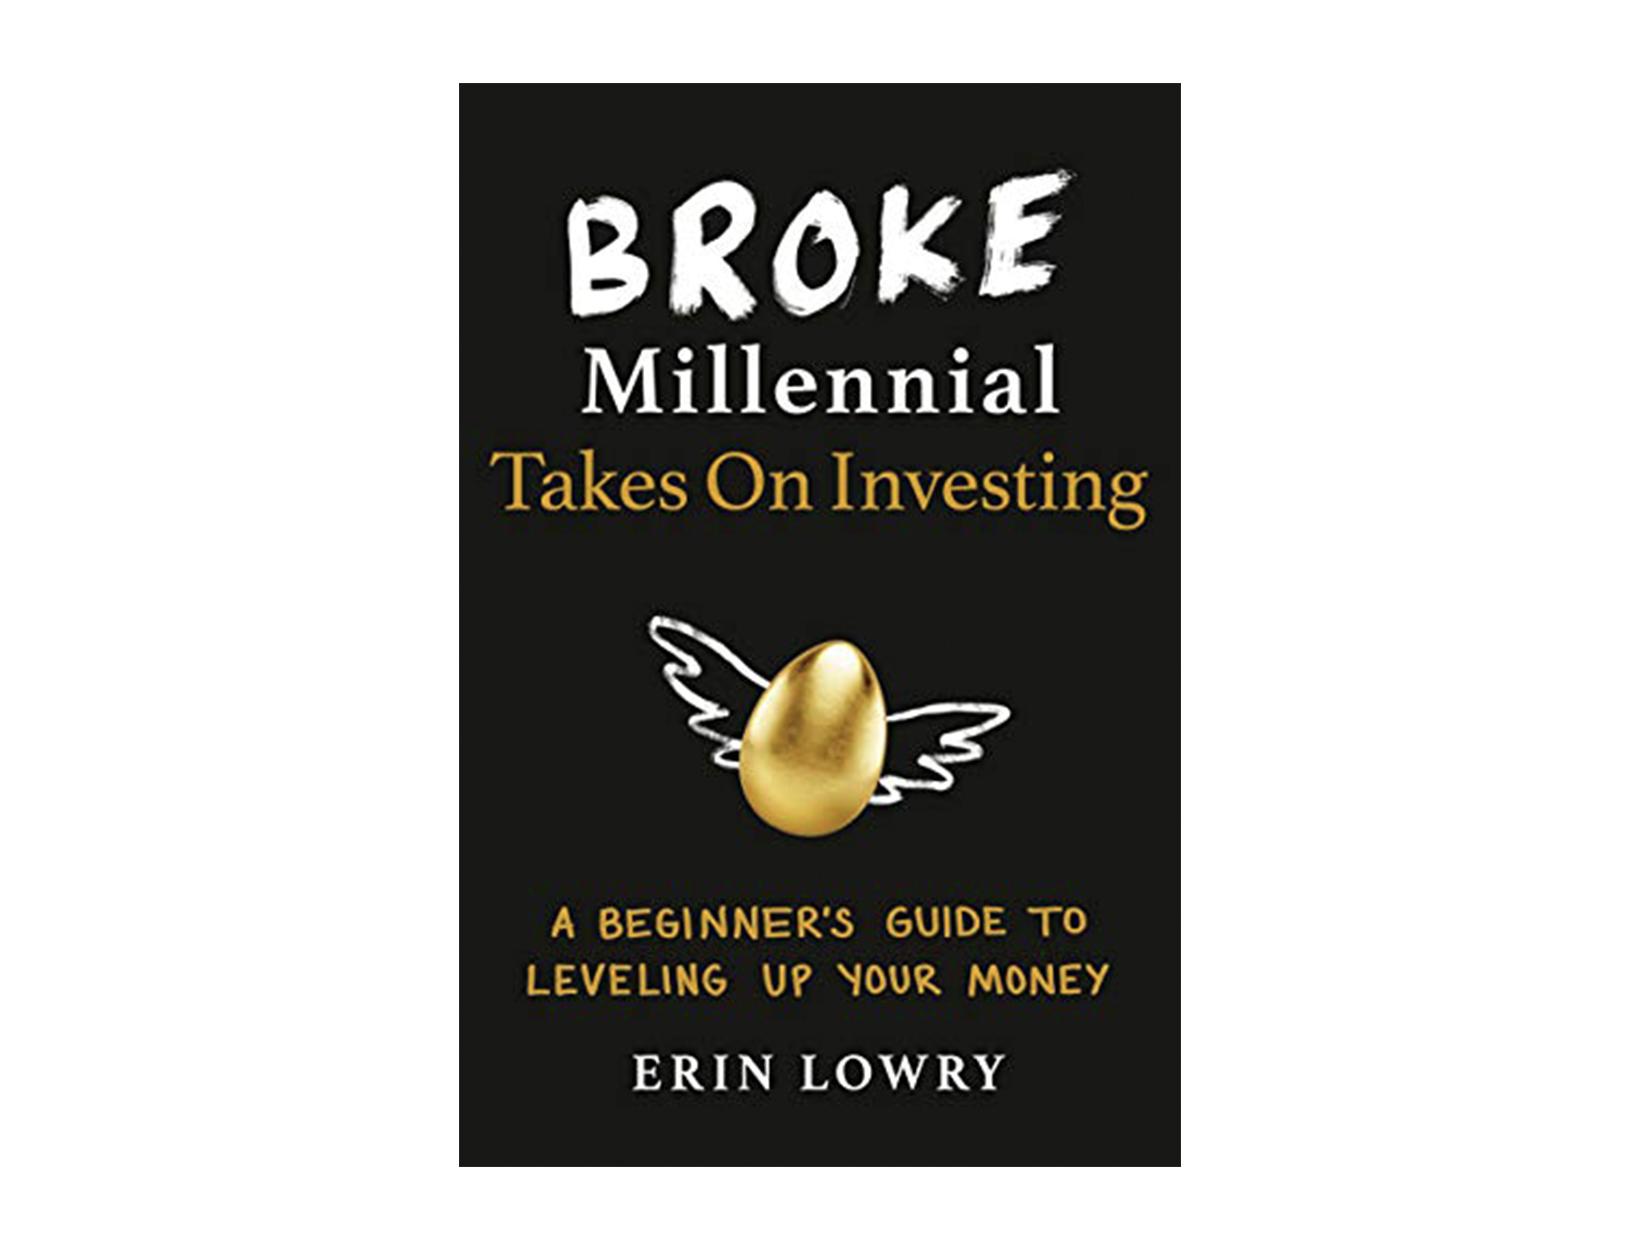 <em>Broke Millennial Takes On Investing</em> by Erin Lowry